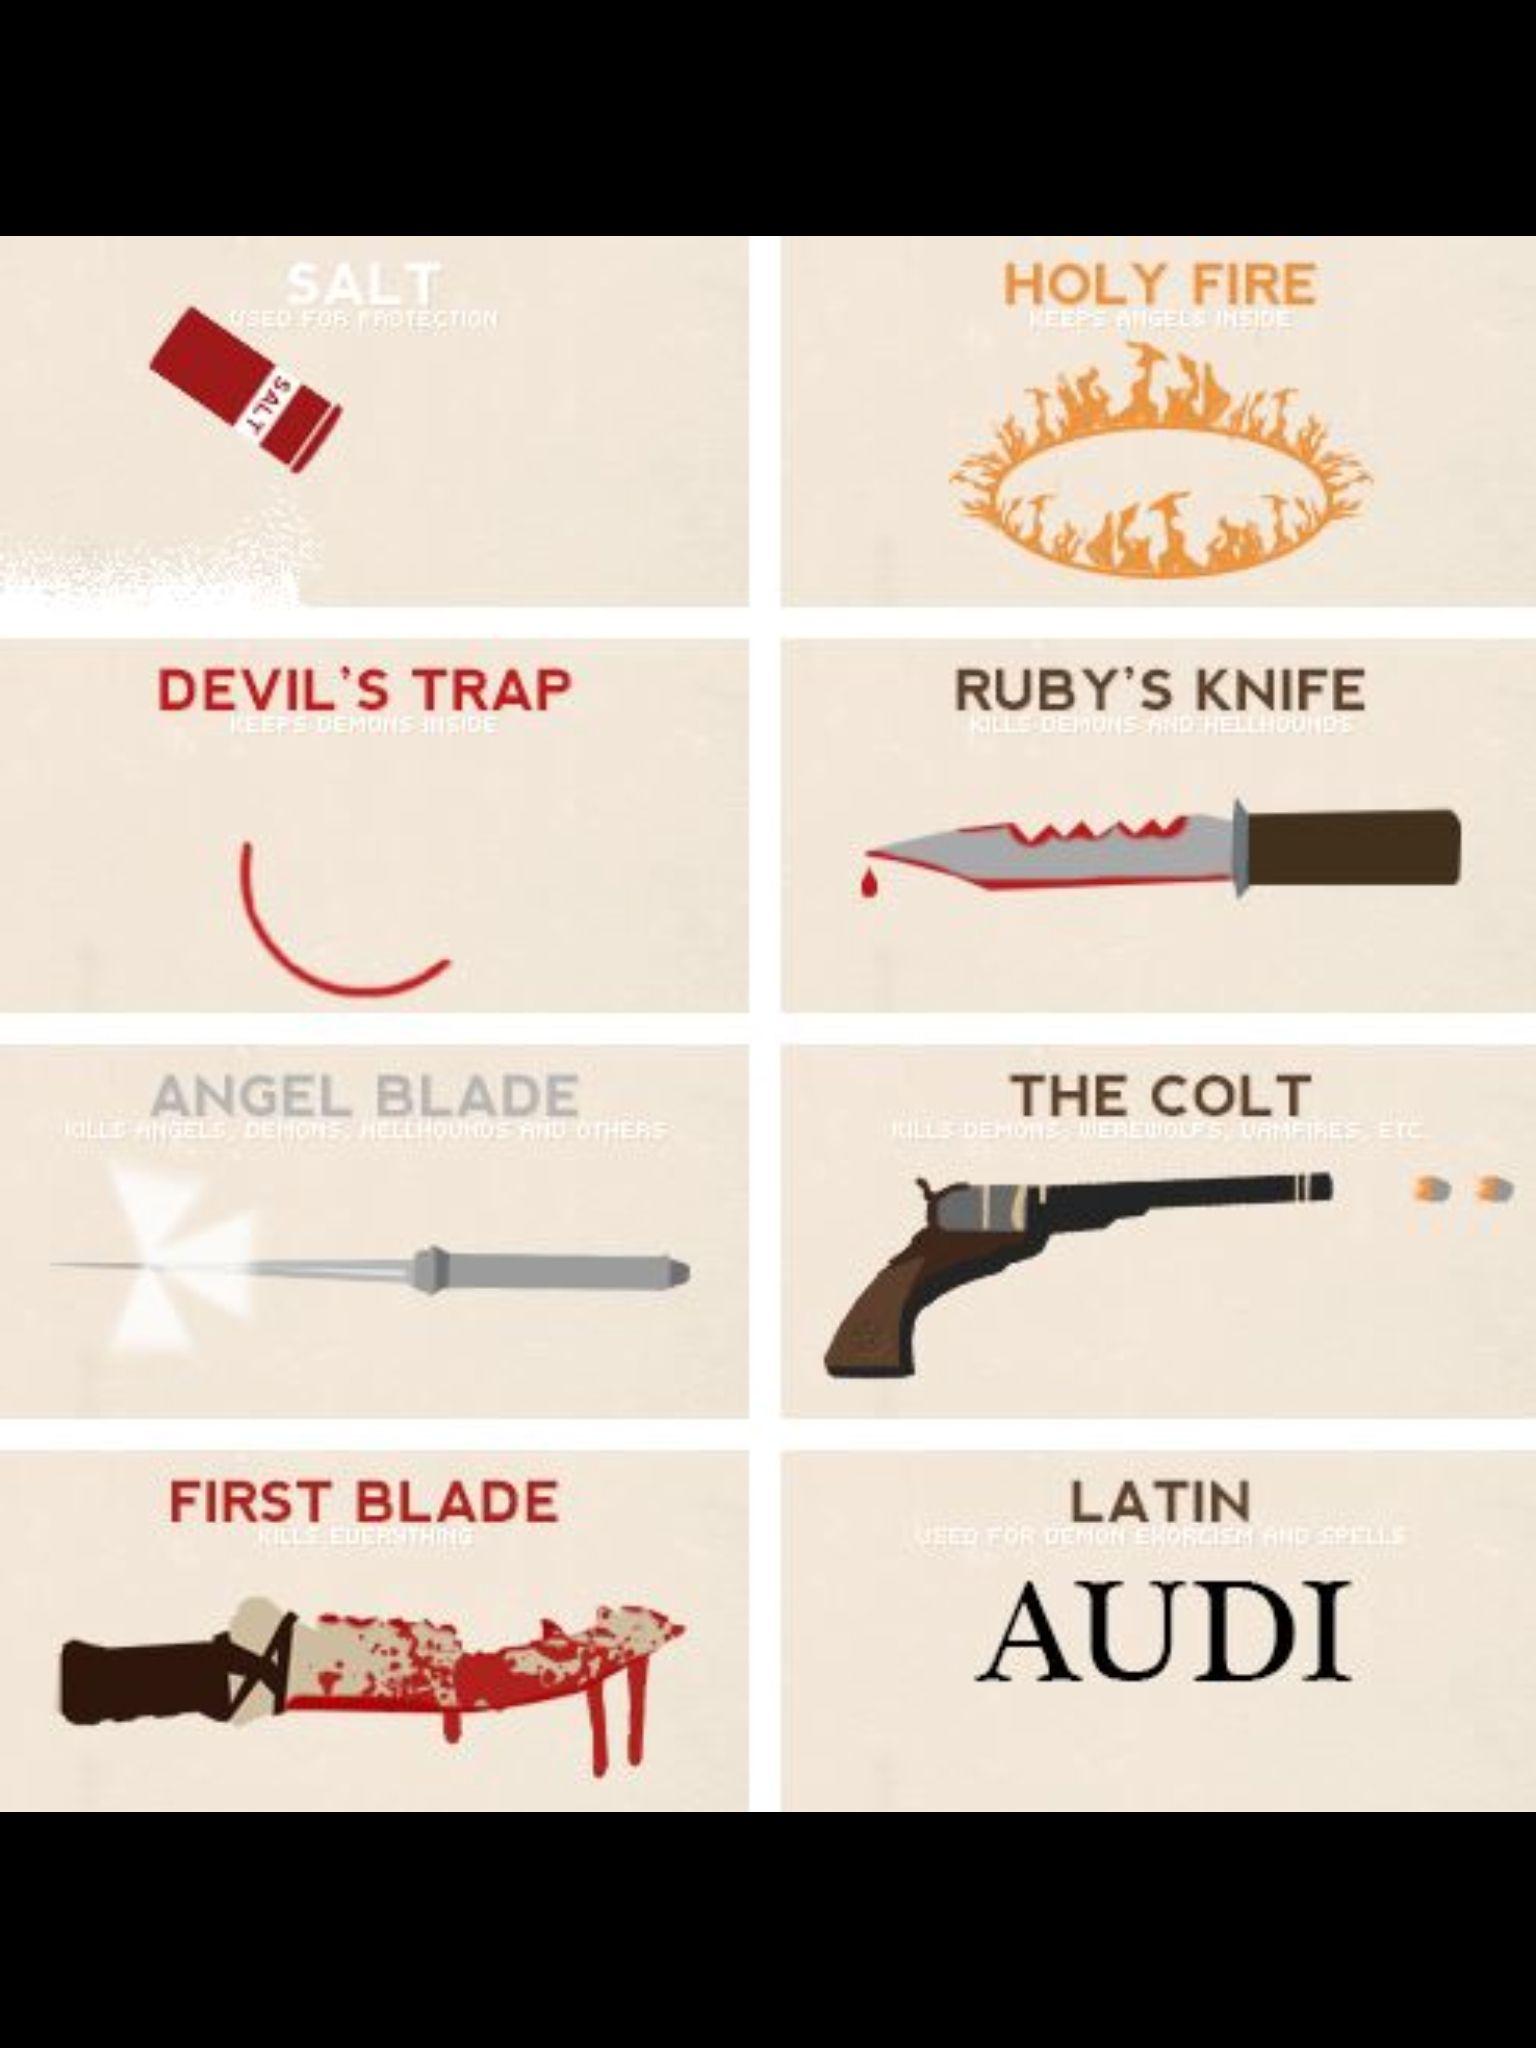 Supernatural weapons